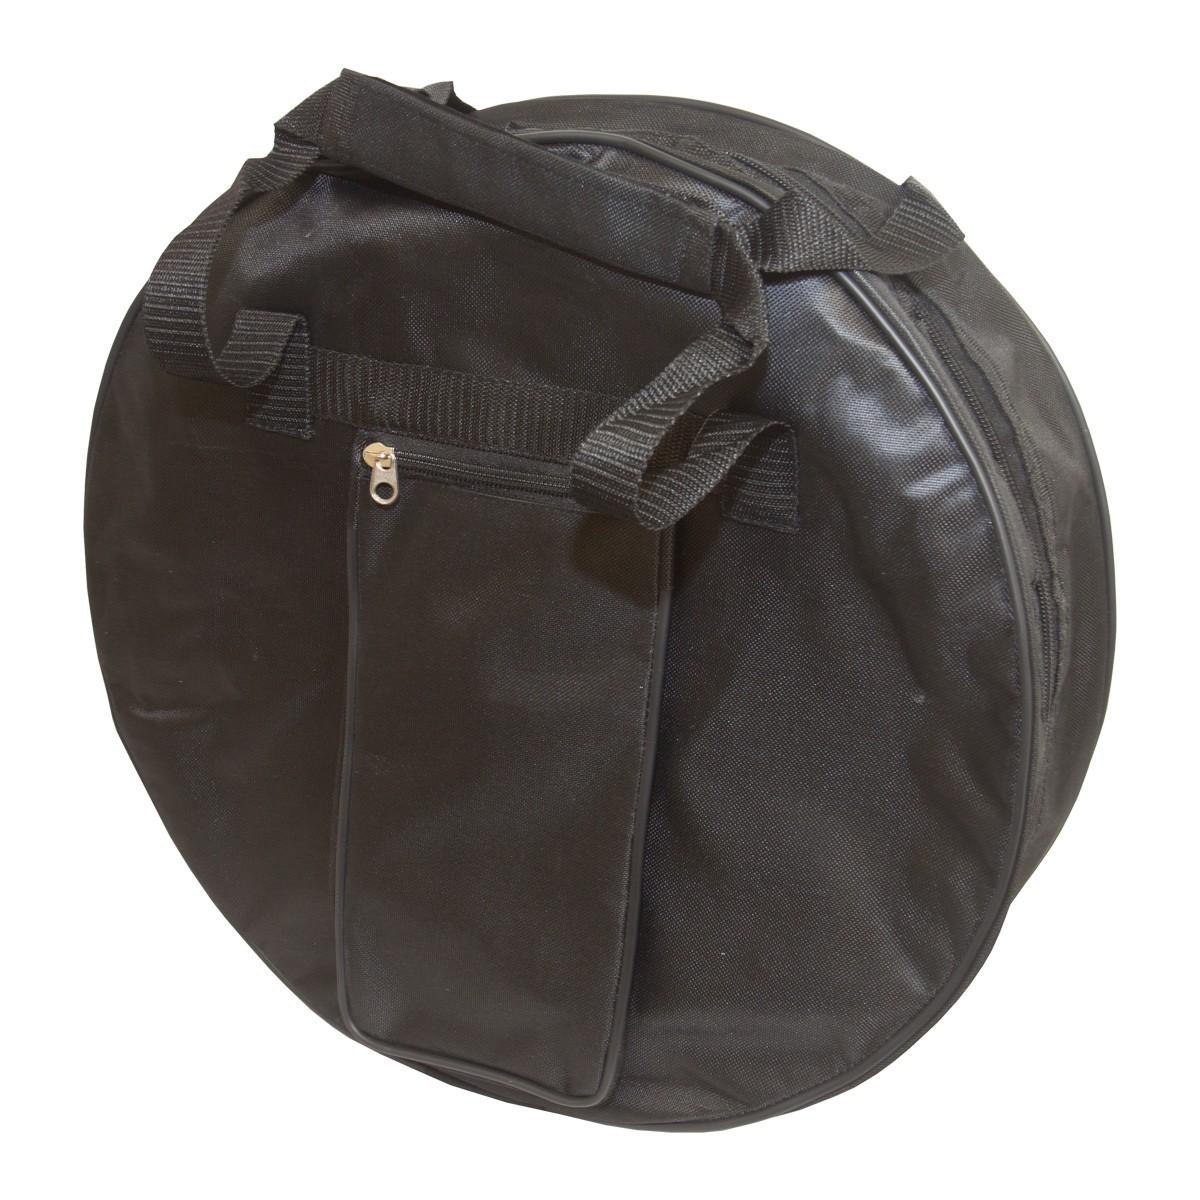 Roosebeck Economy Gig Bag for Bodhran 14'x 4.75'